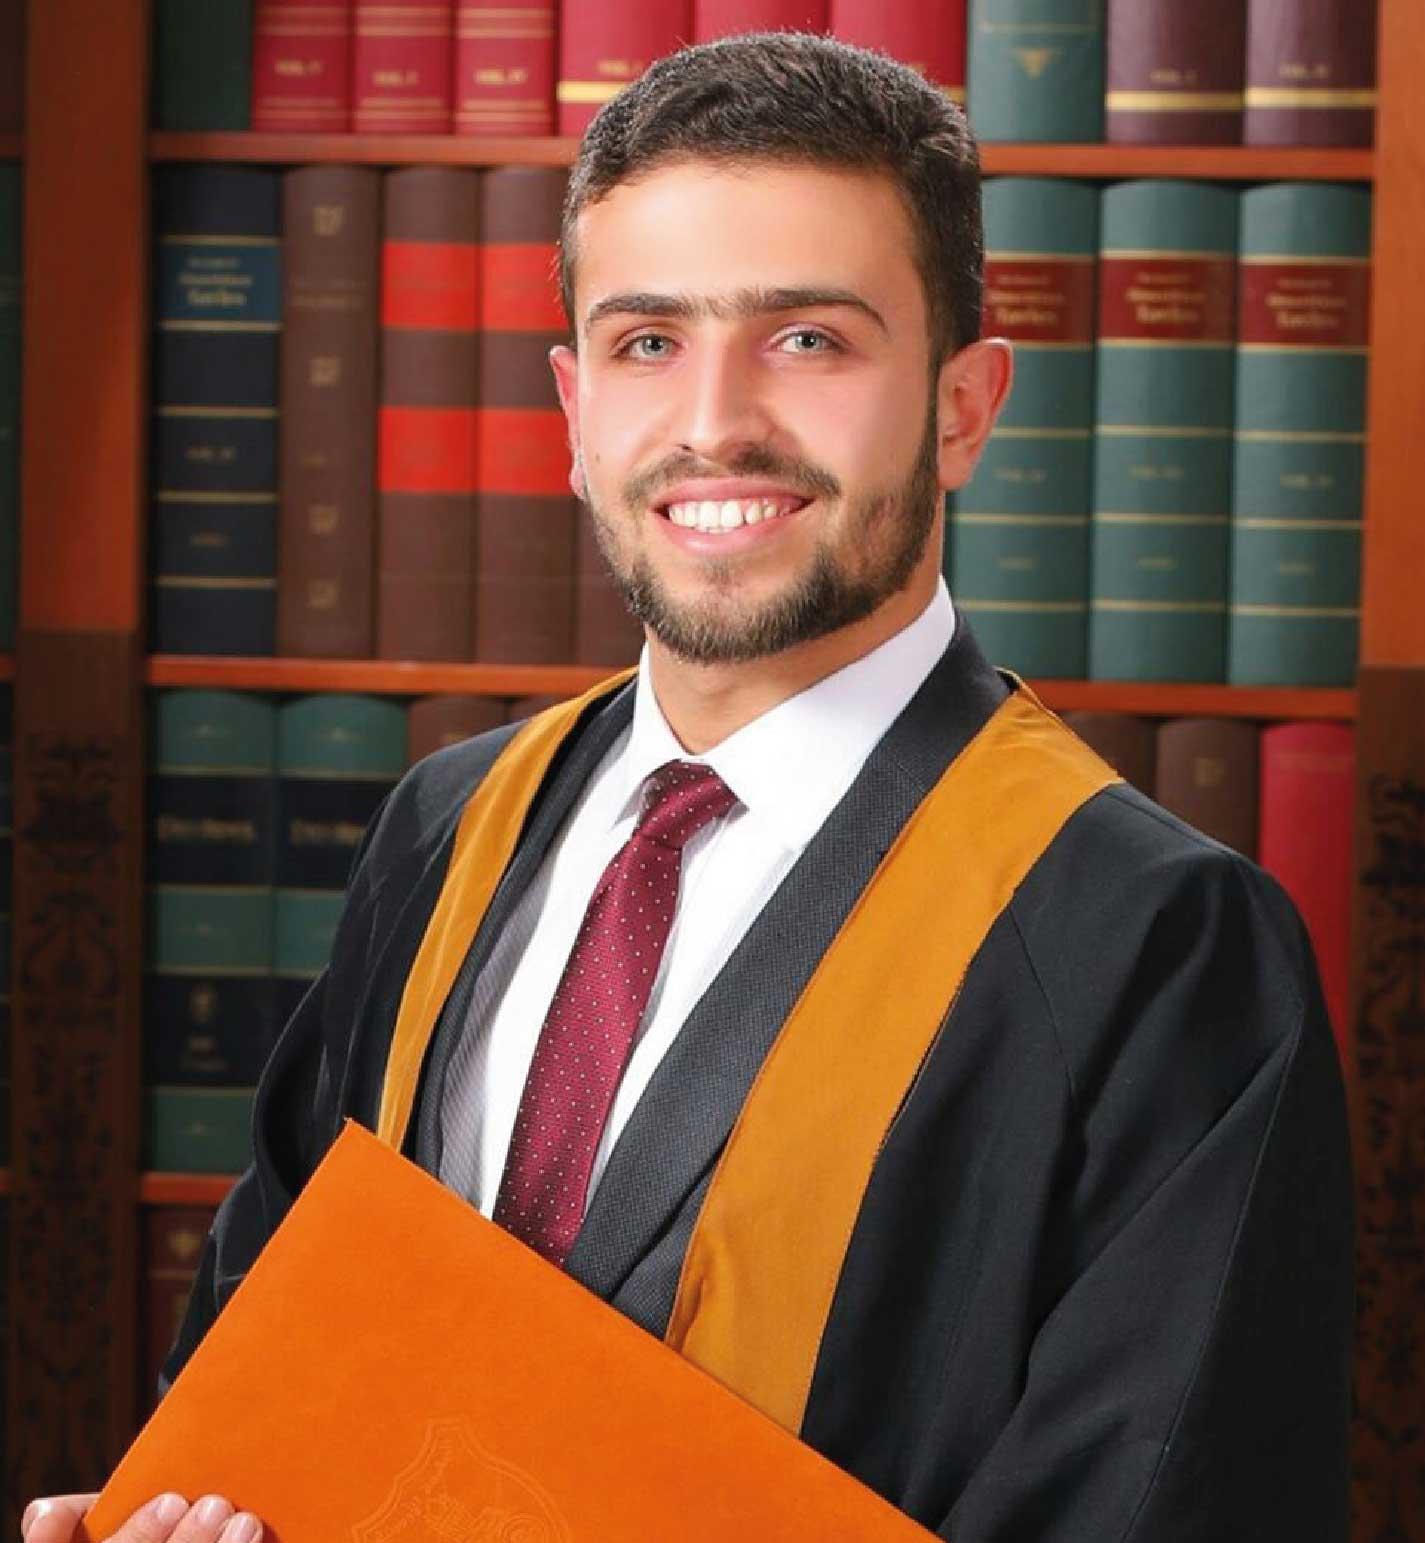 Eng. Mamoun Alazazmeh